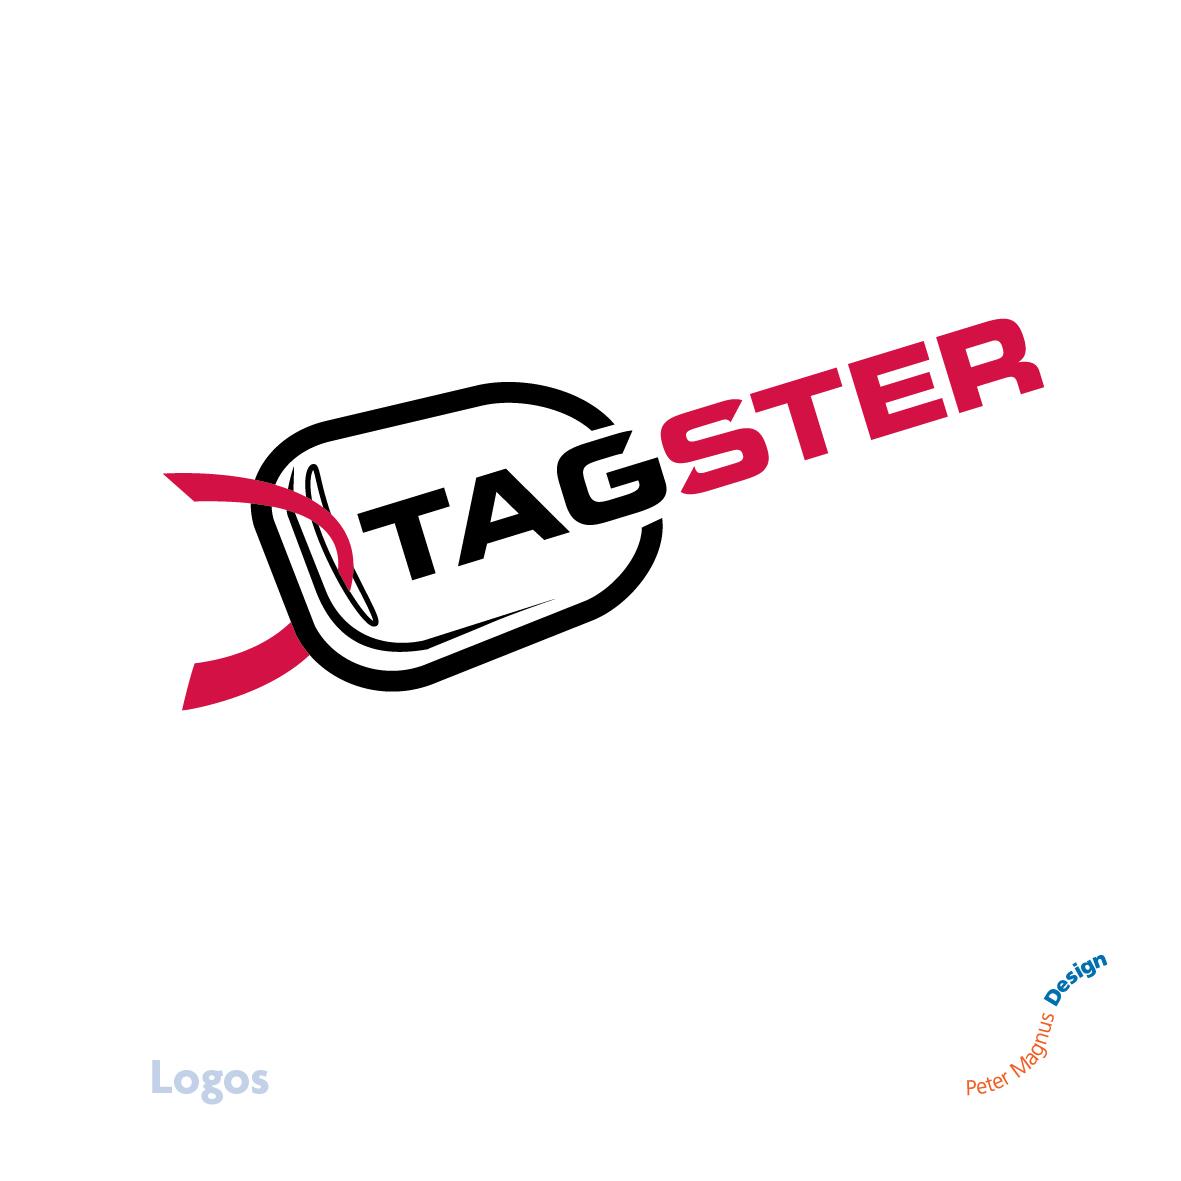 Tagster Motortrade logo, West London